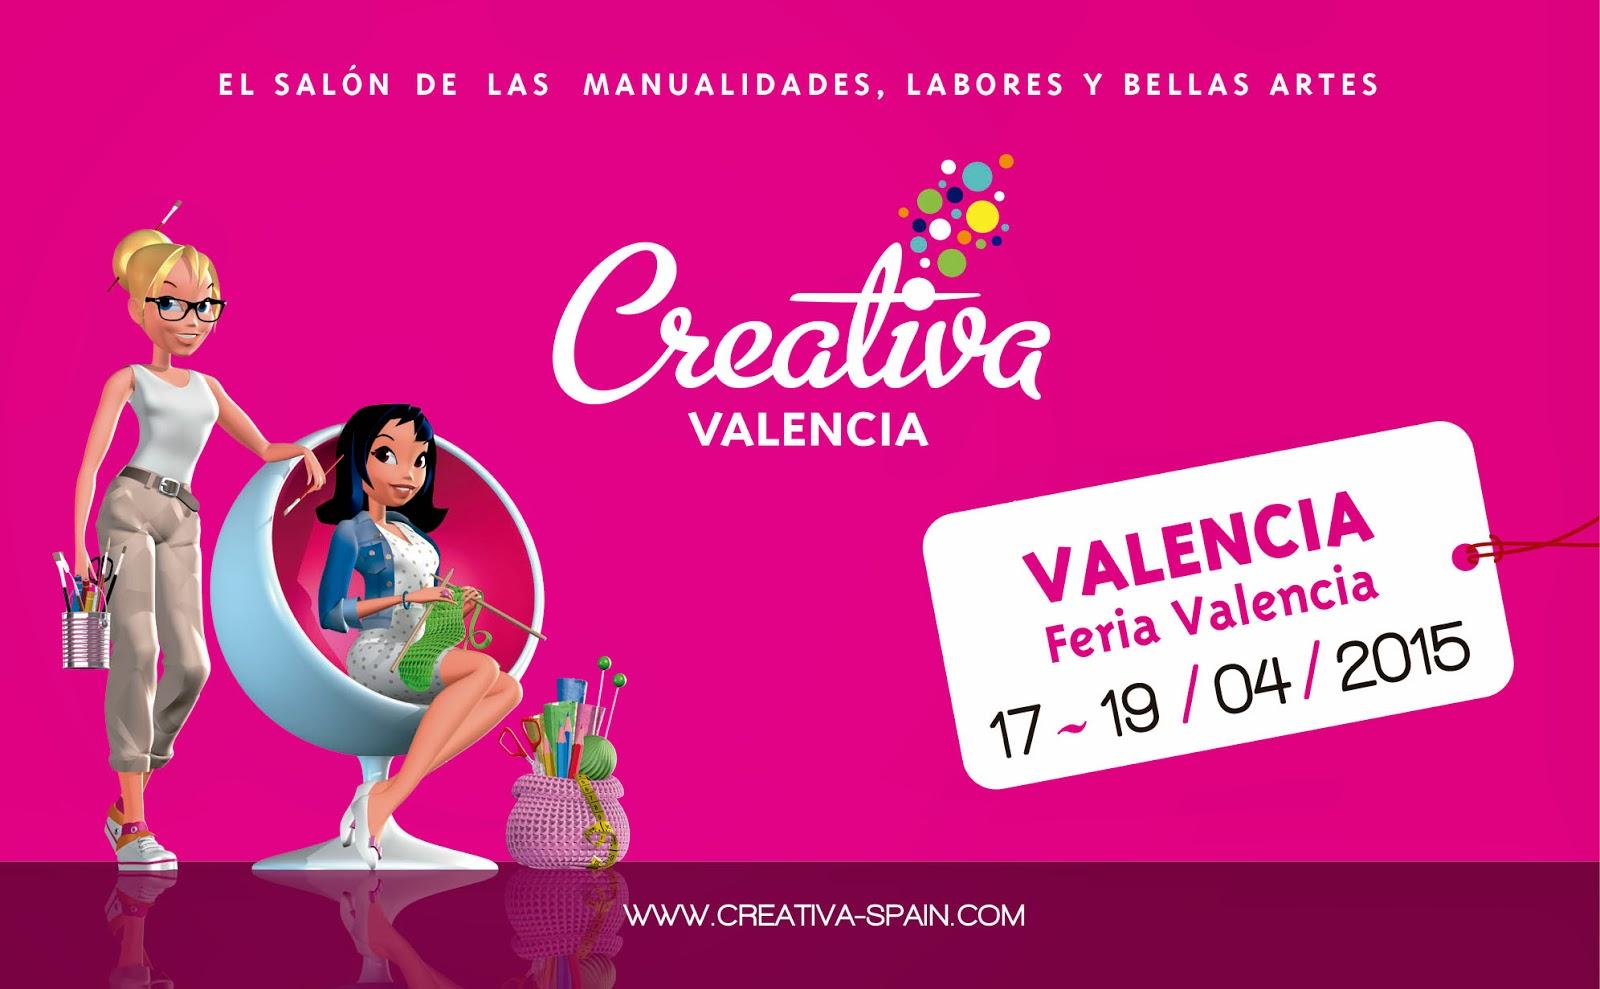 http://www.creativa-spain.com/creativa/valencia/default.aspx